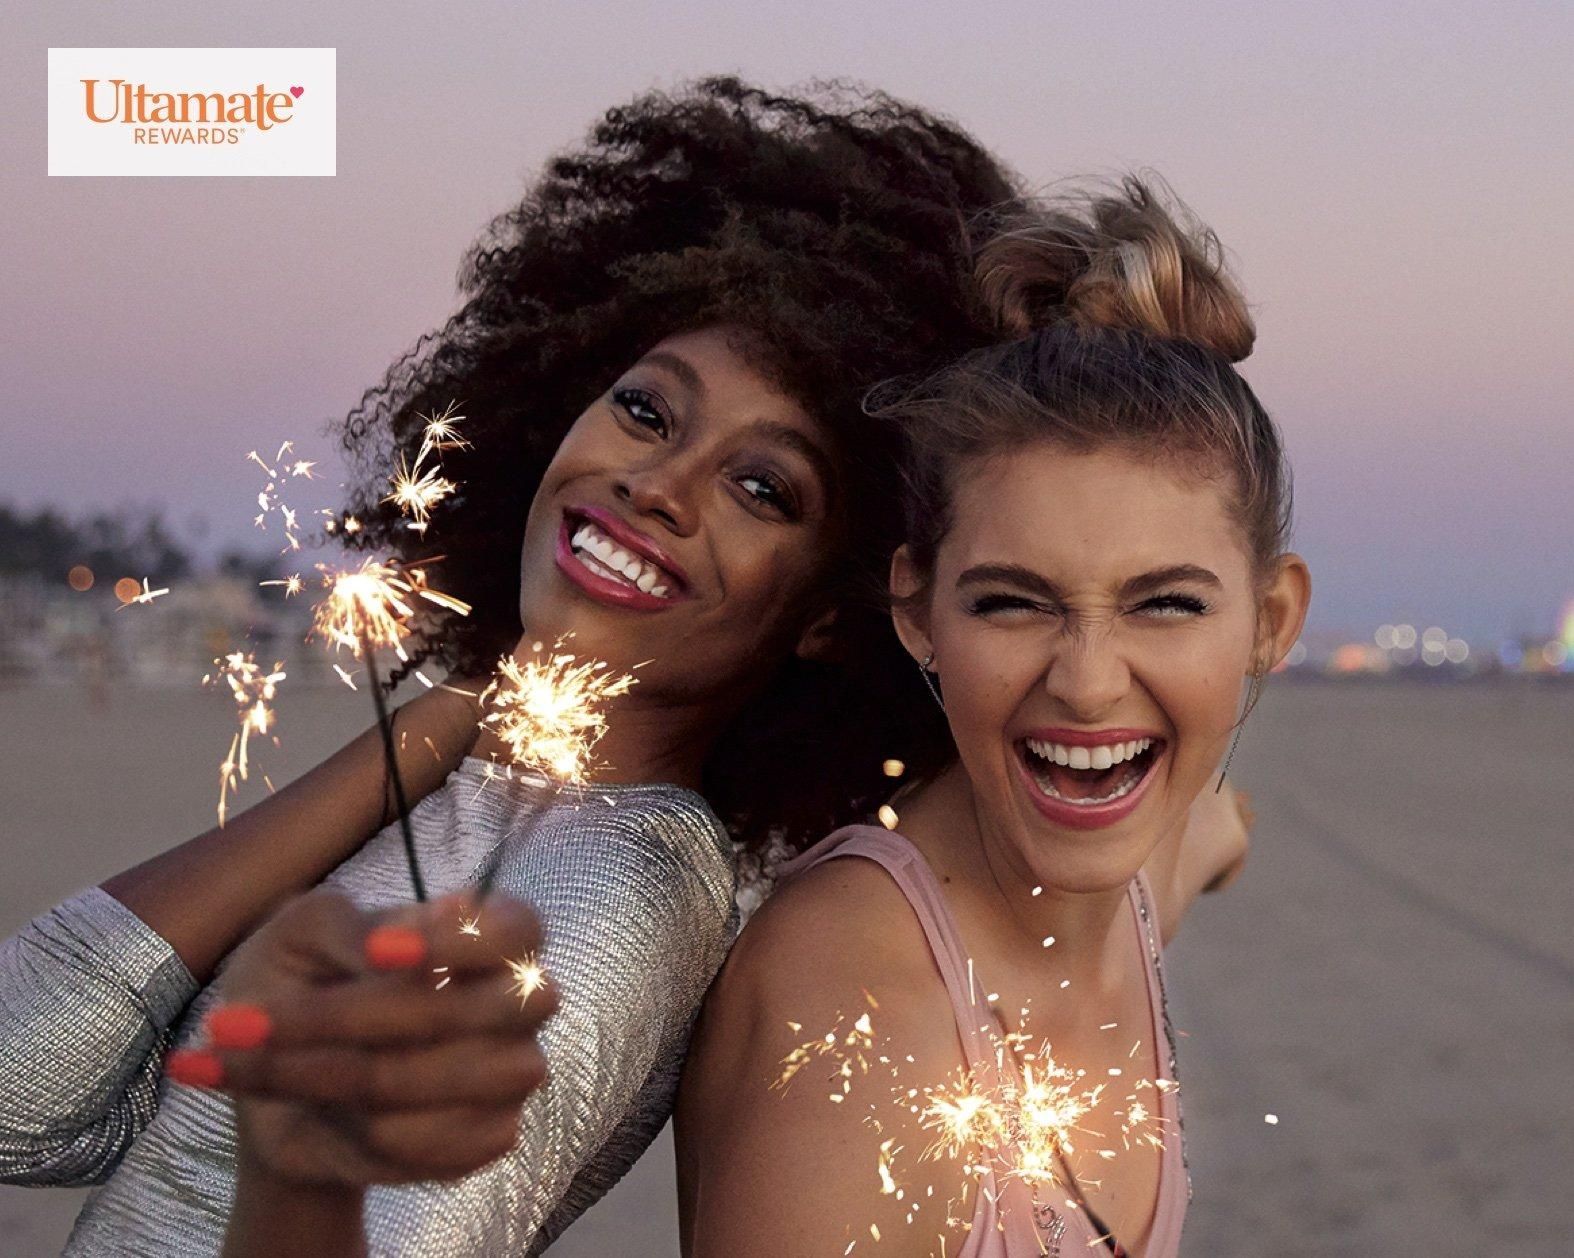 Two women celebrating on the beach.